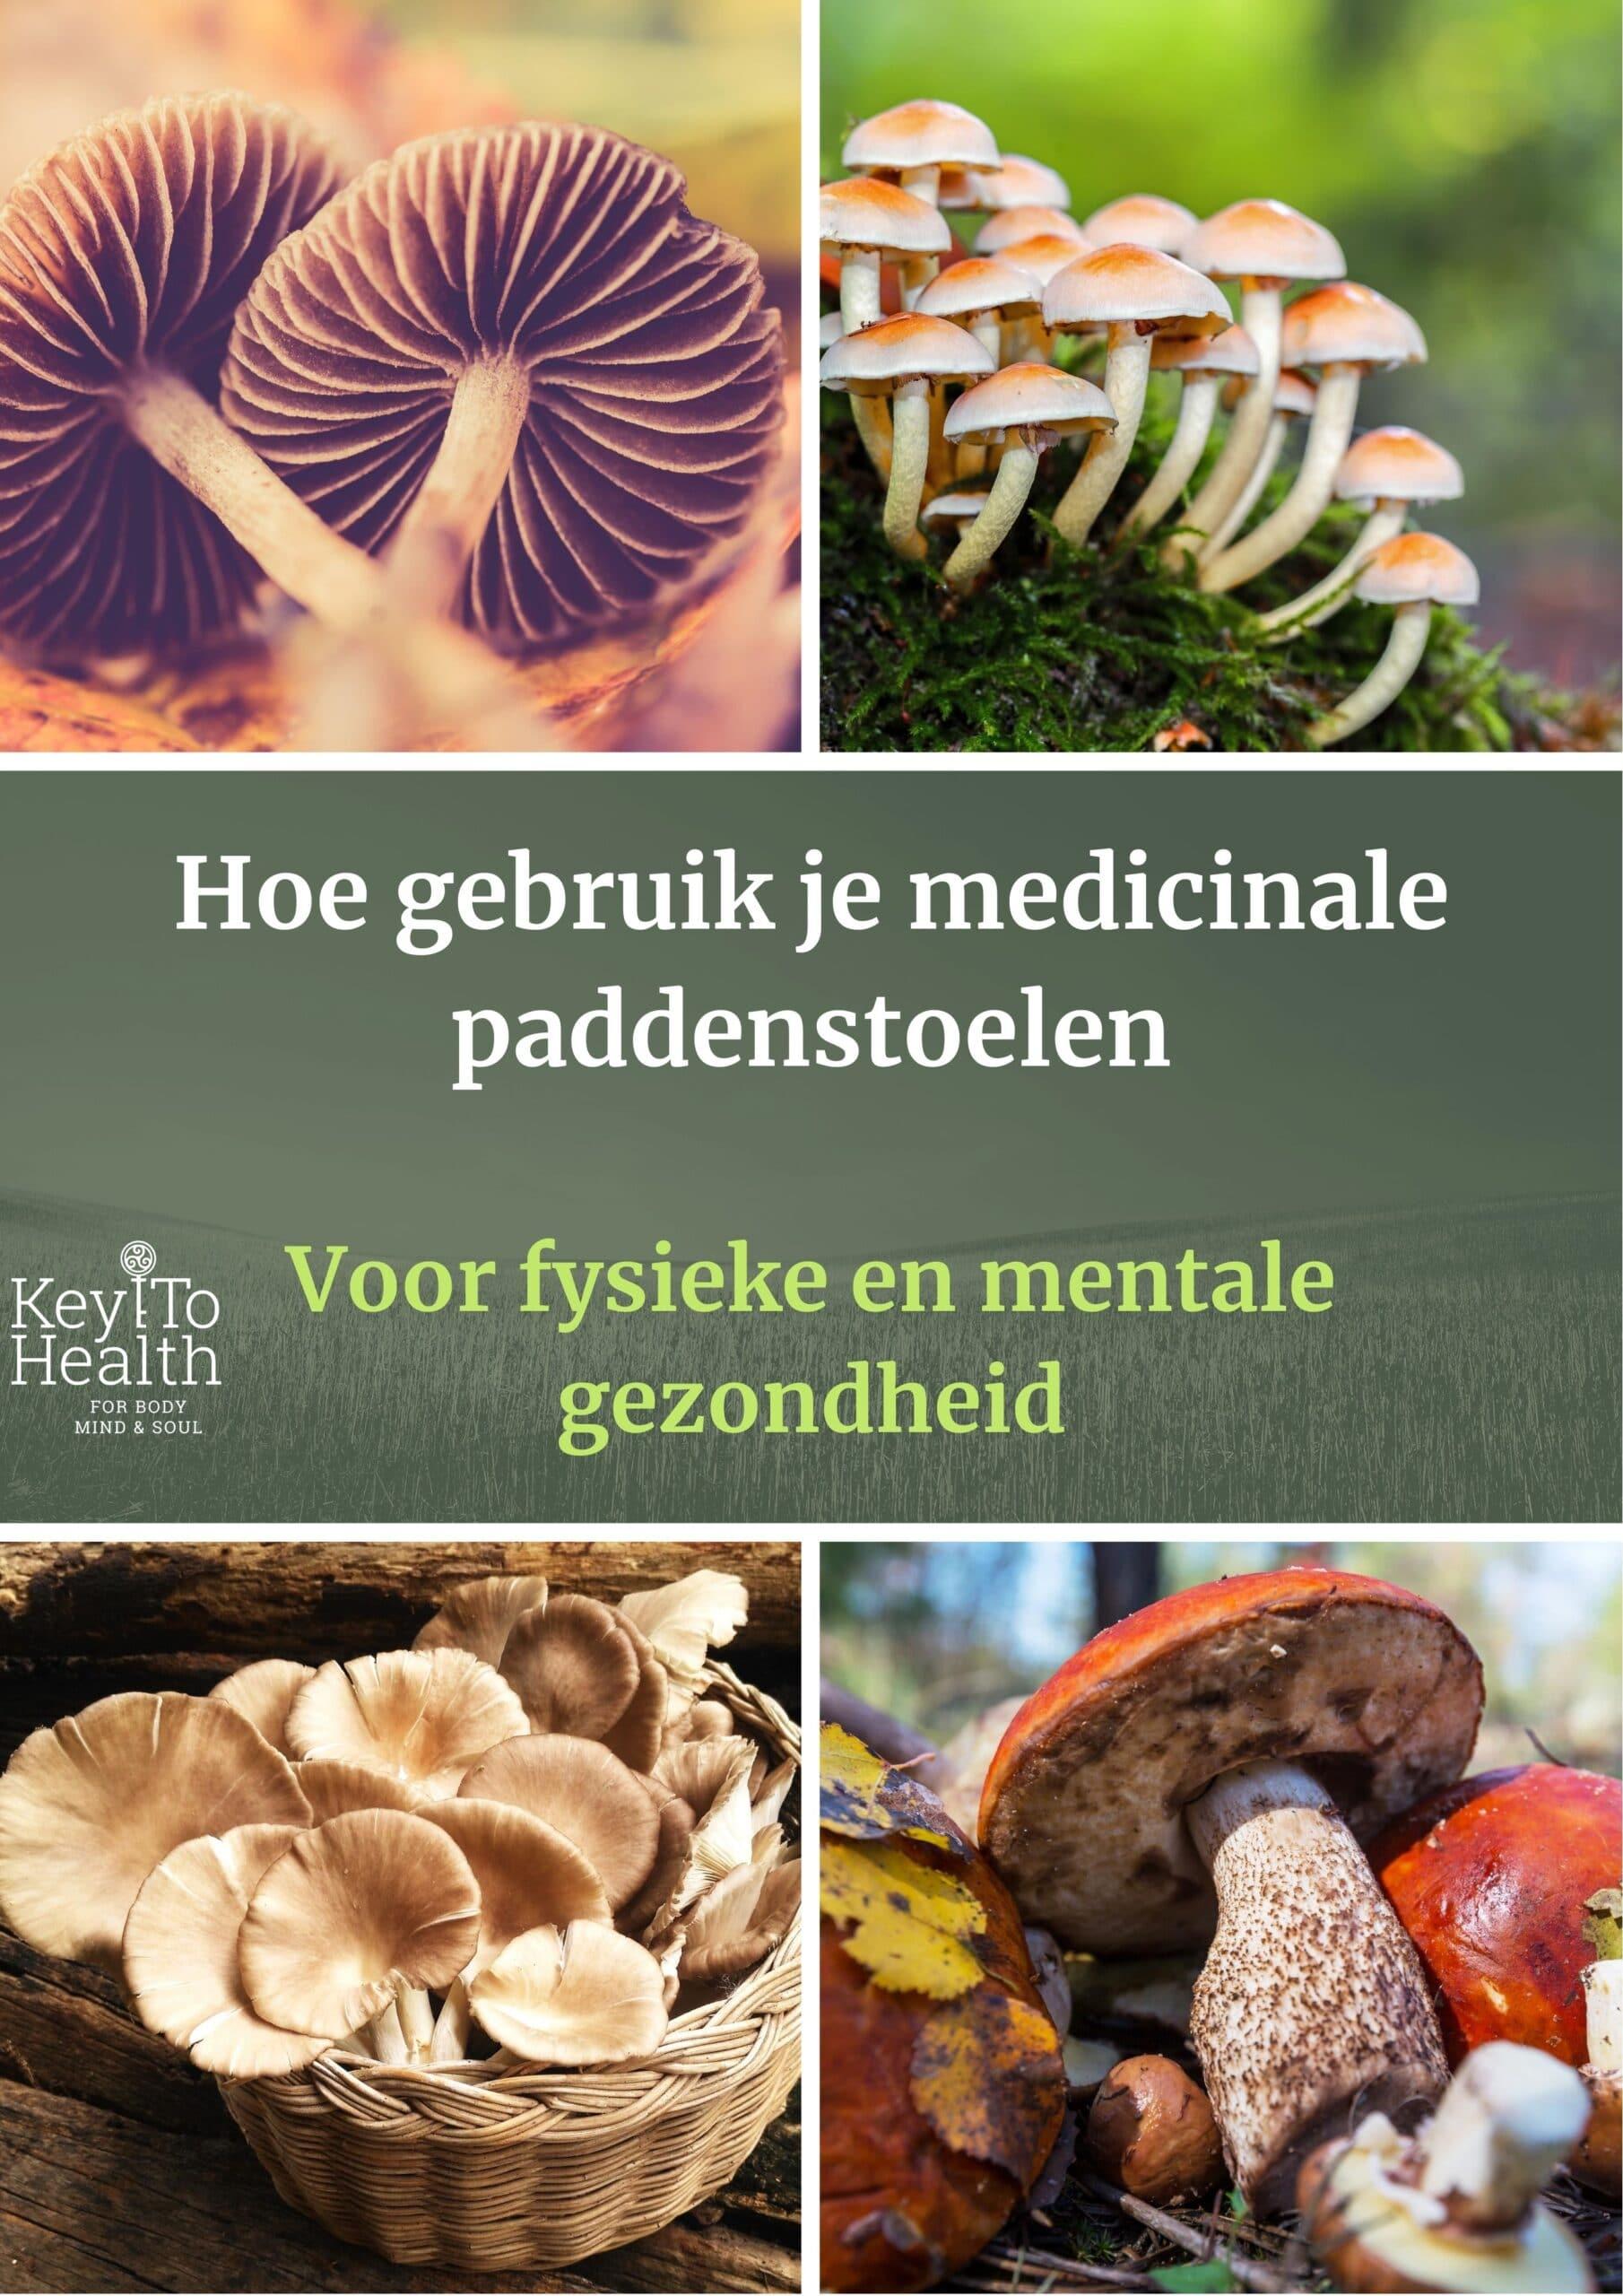 e-book medicinale paddenstoelen